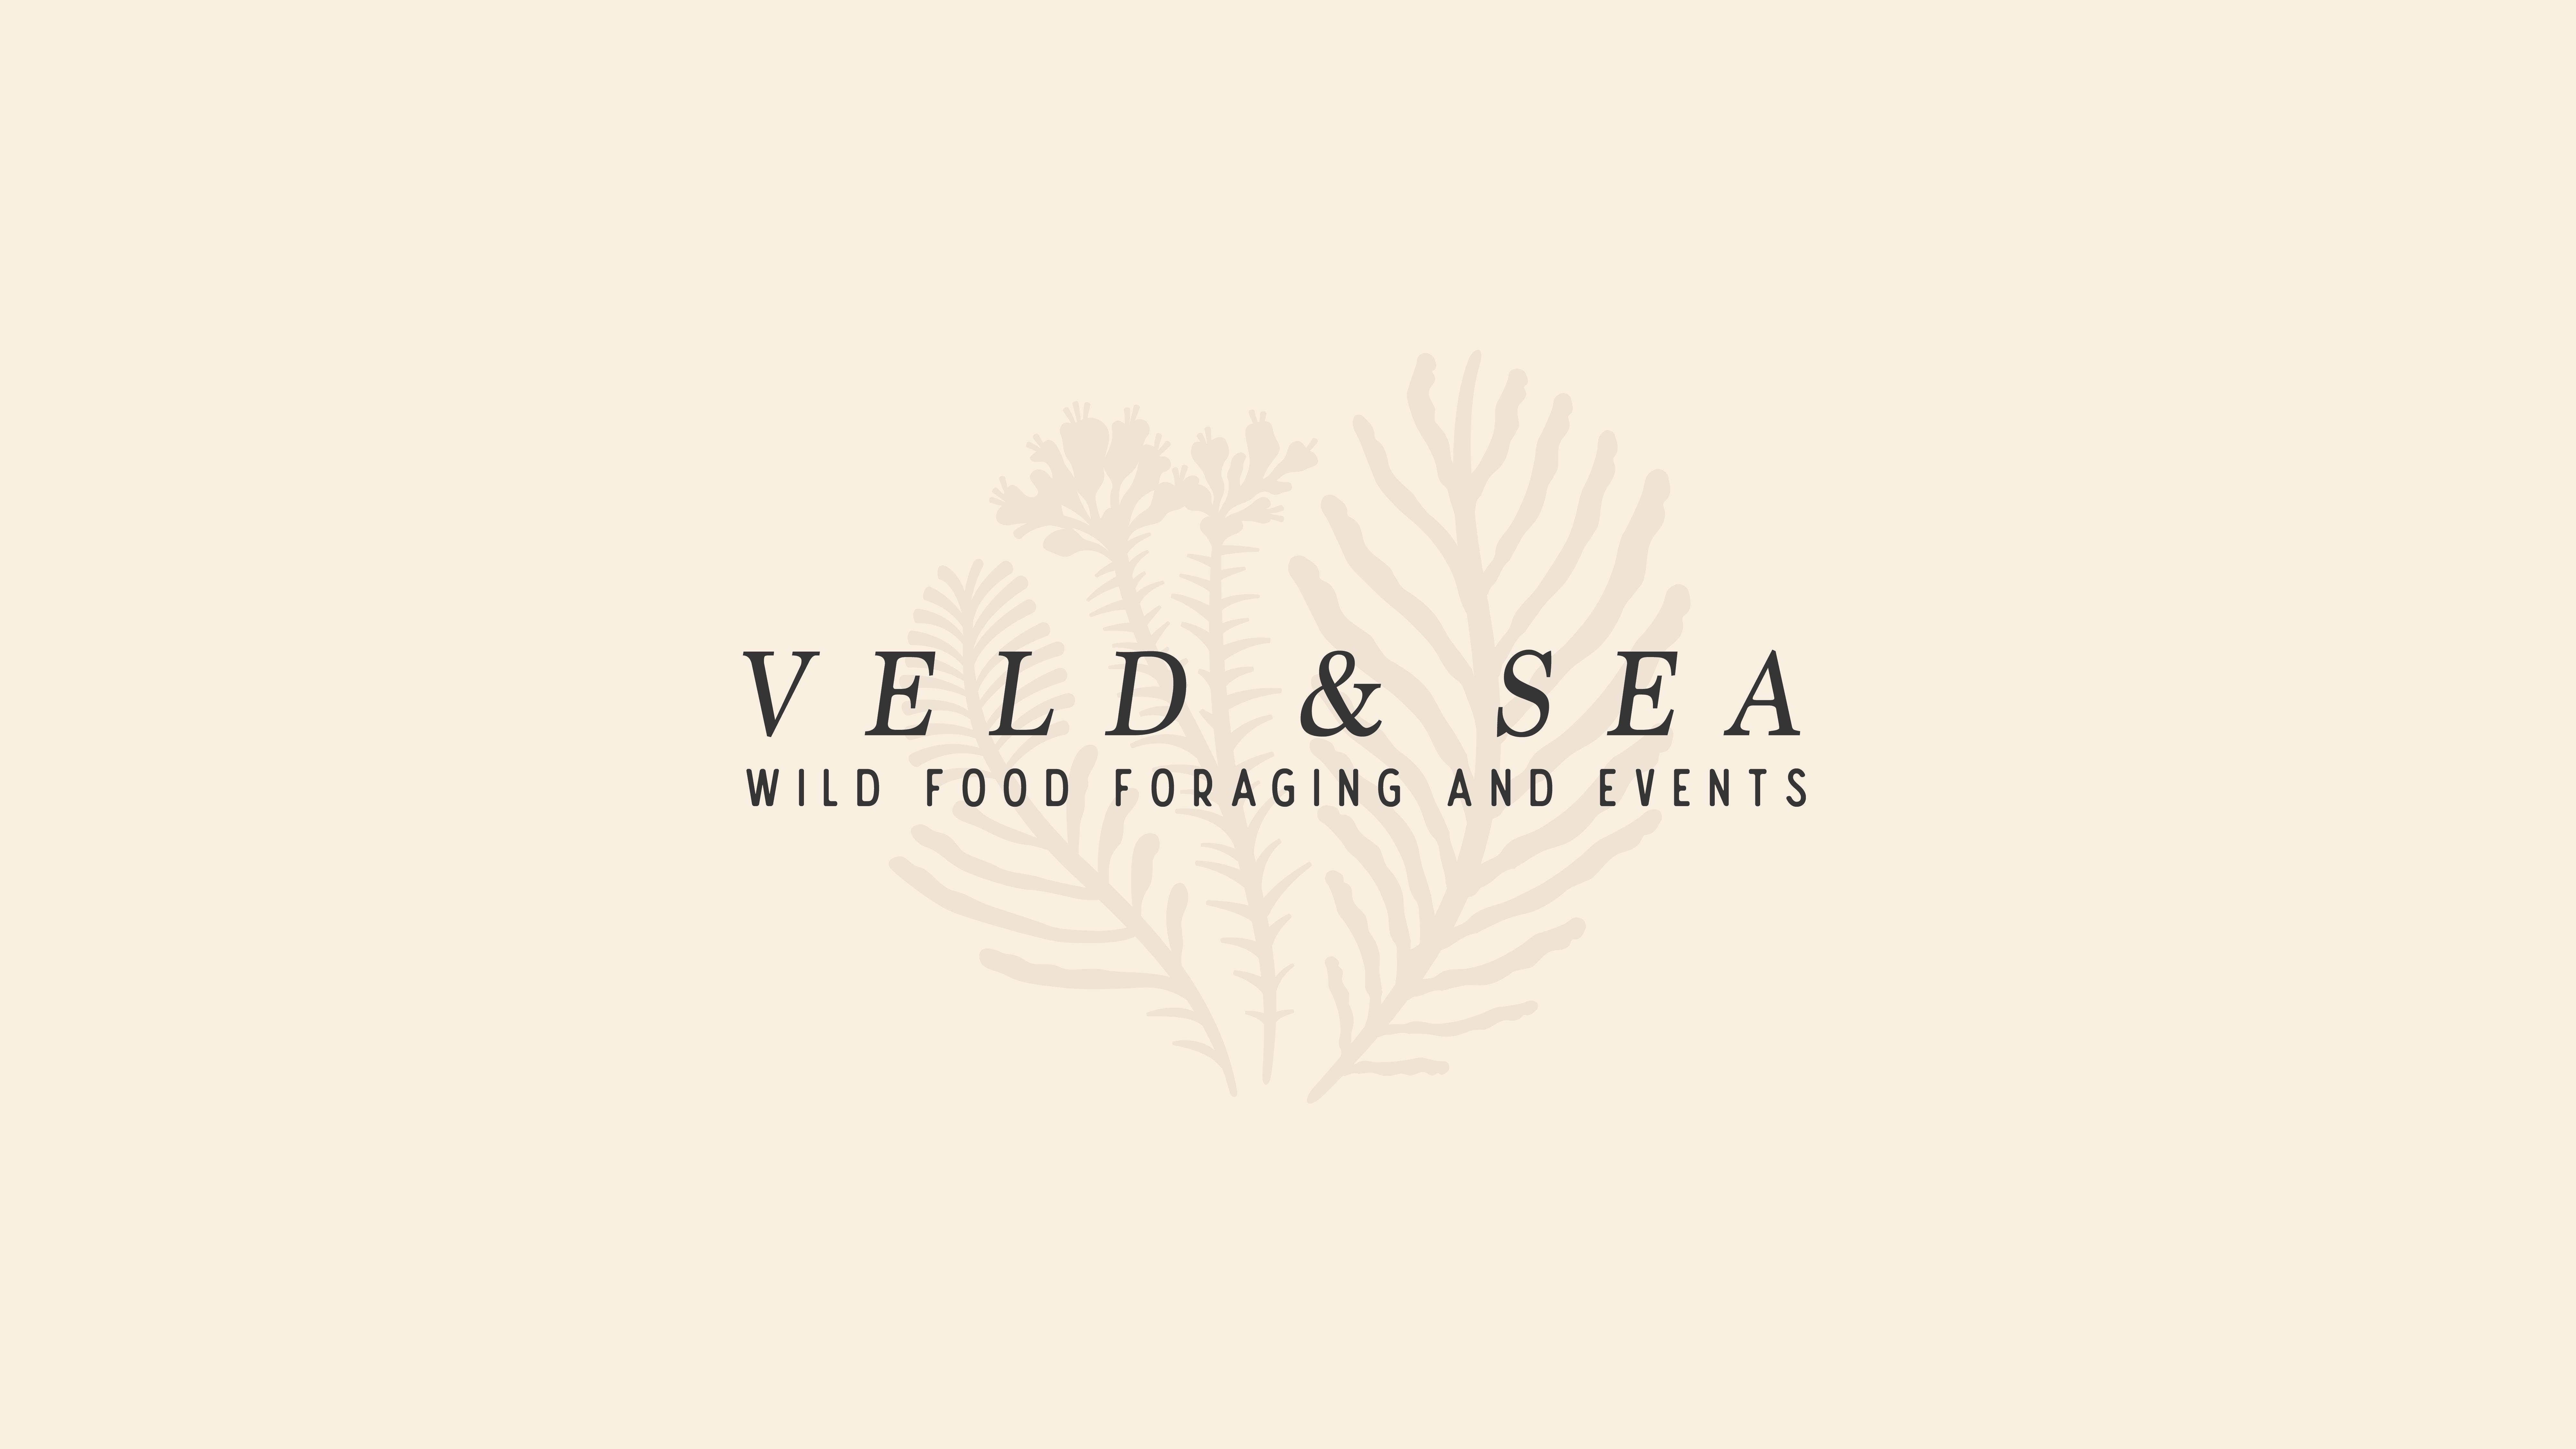 VELD AND SEA_SOCIAL MEDIA_Facebook EVENT IMAGE copy